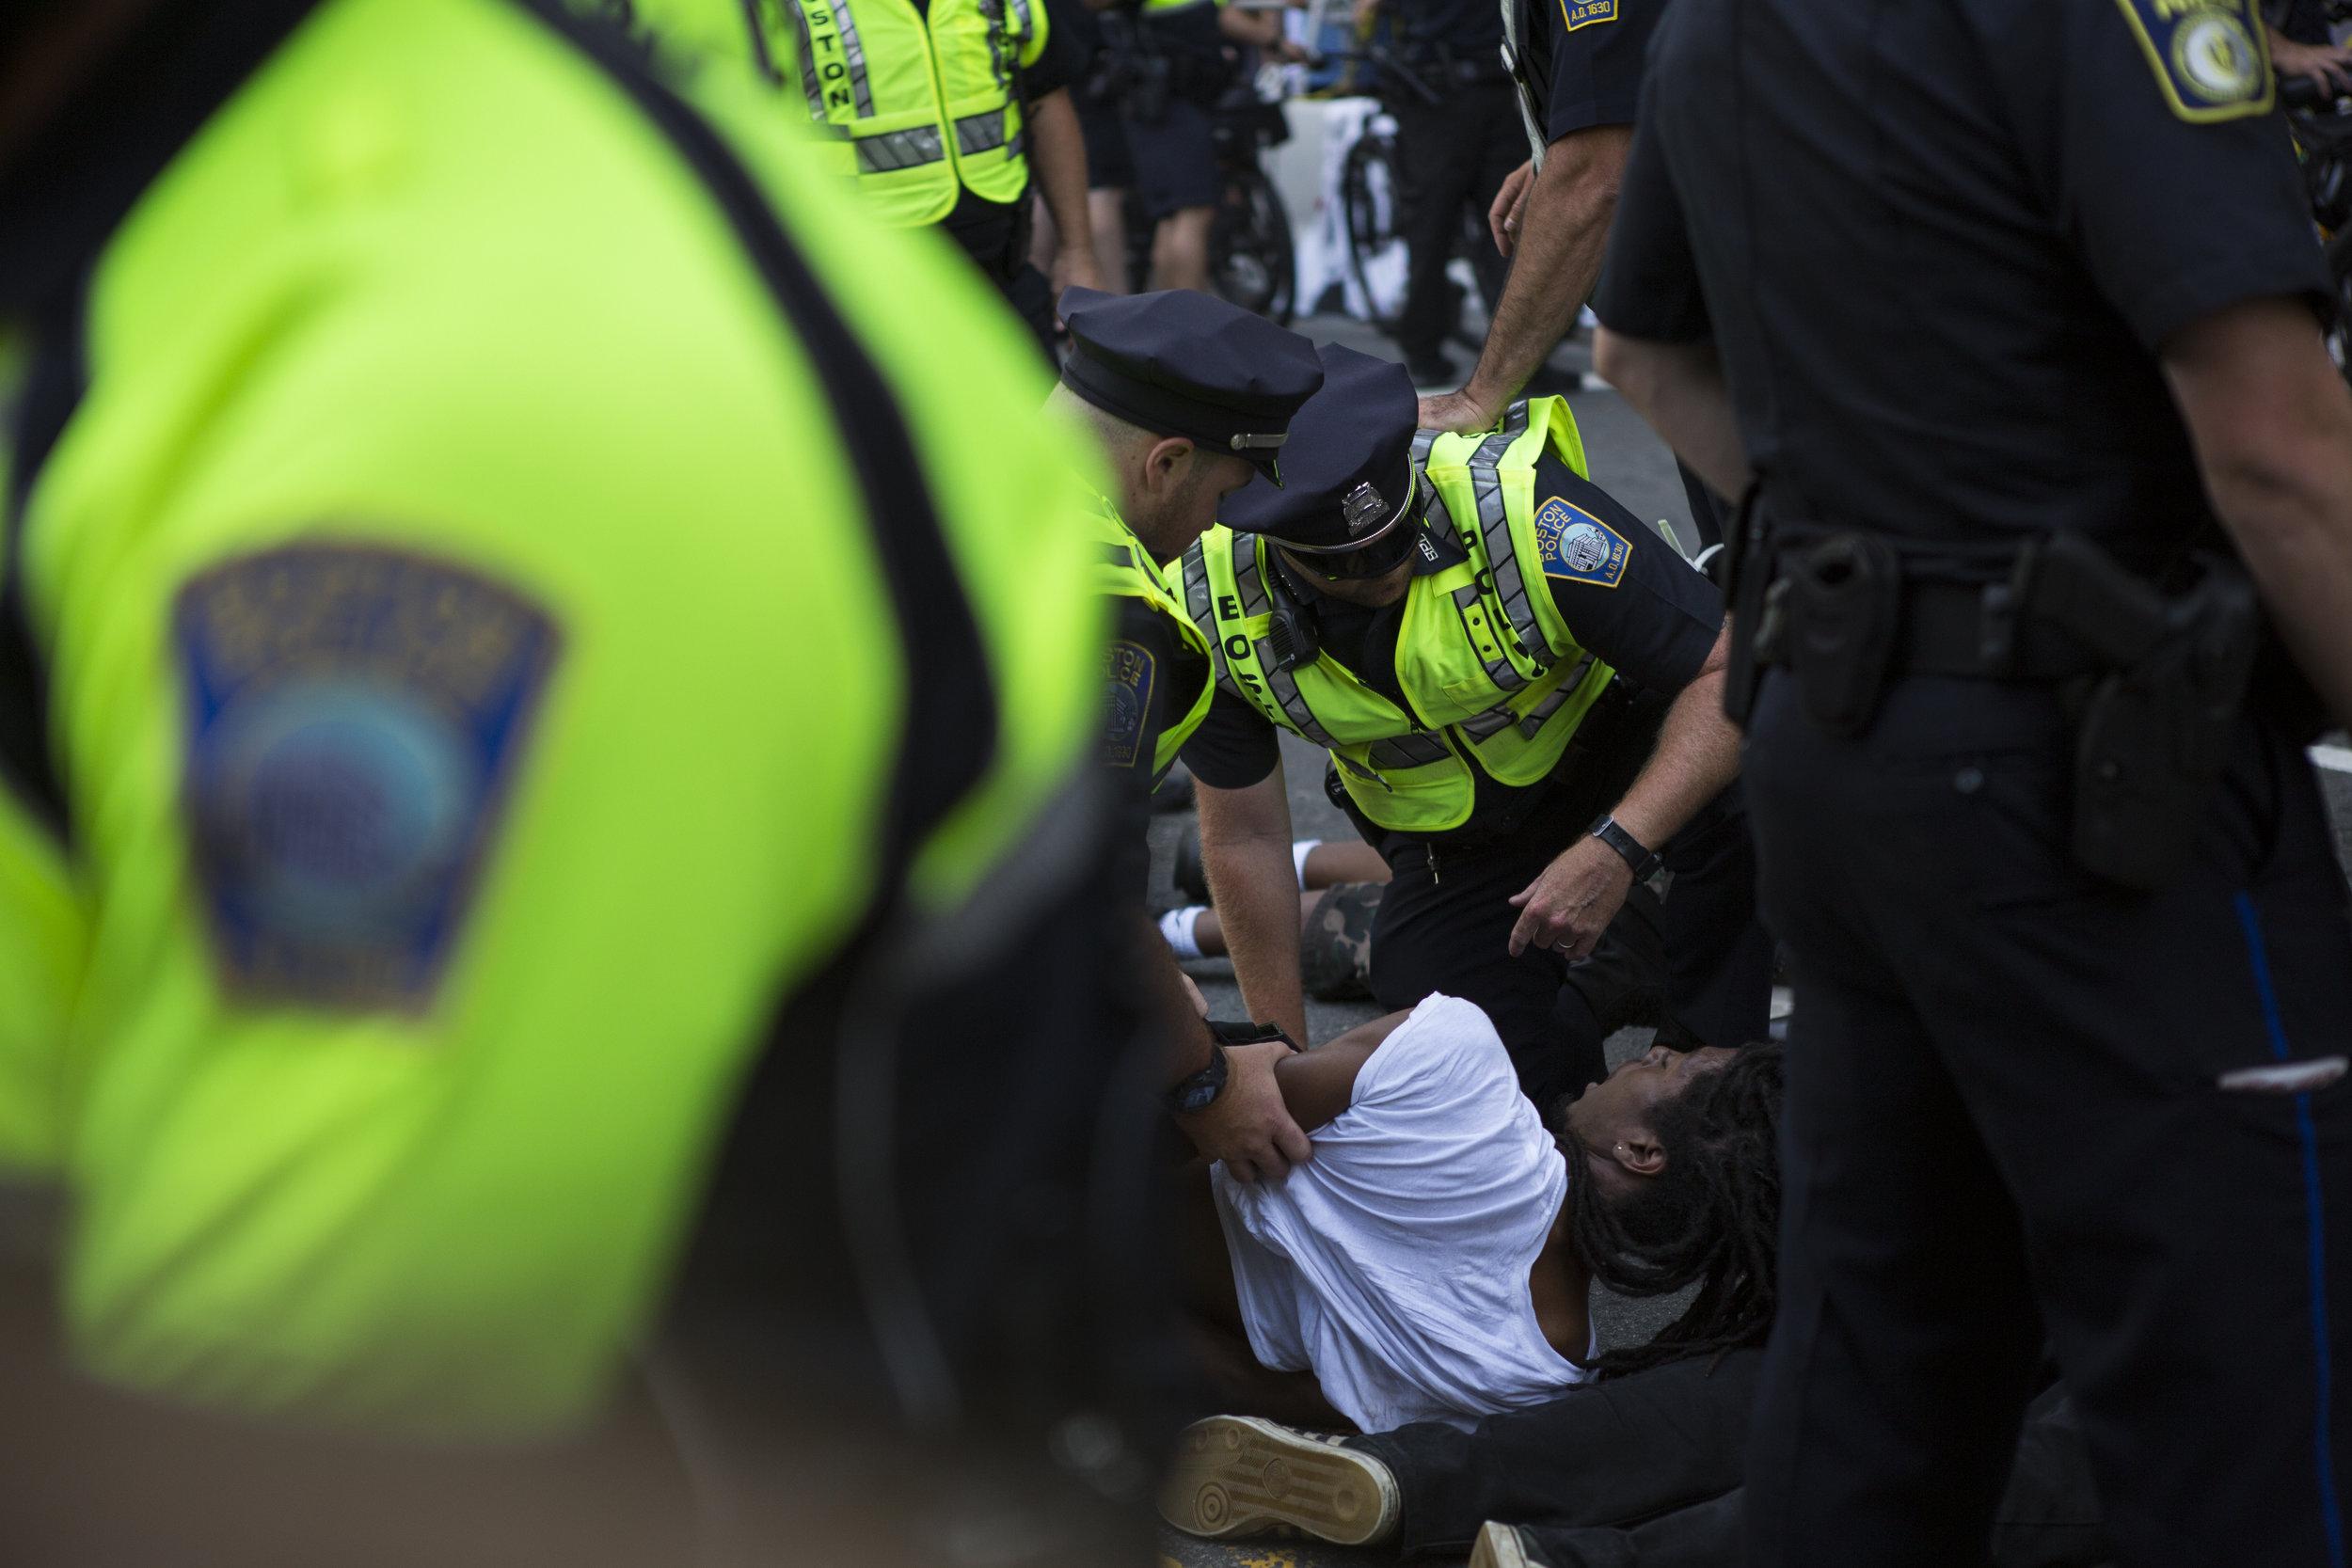 Boylston_Arrests_03.jpg